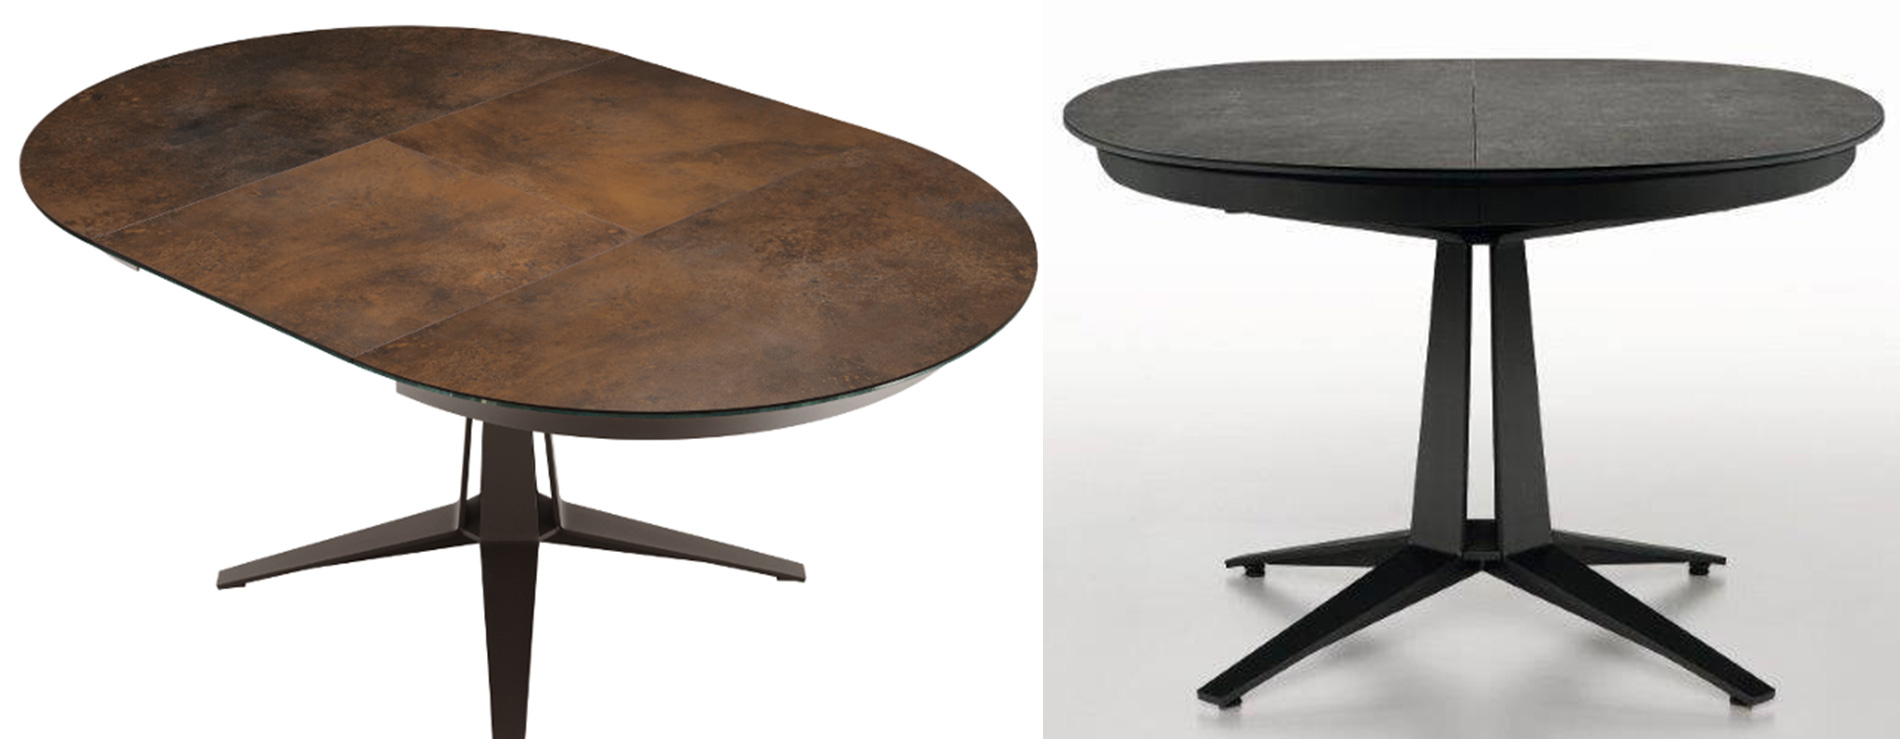 tavolo rotondo allungabile Link di Midj